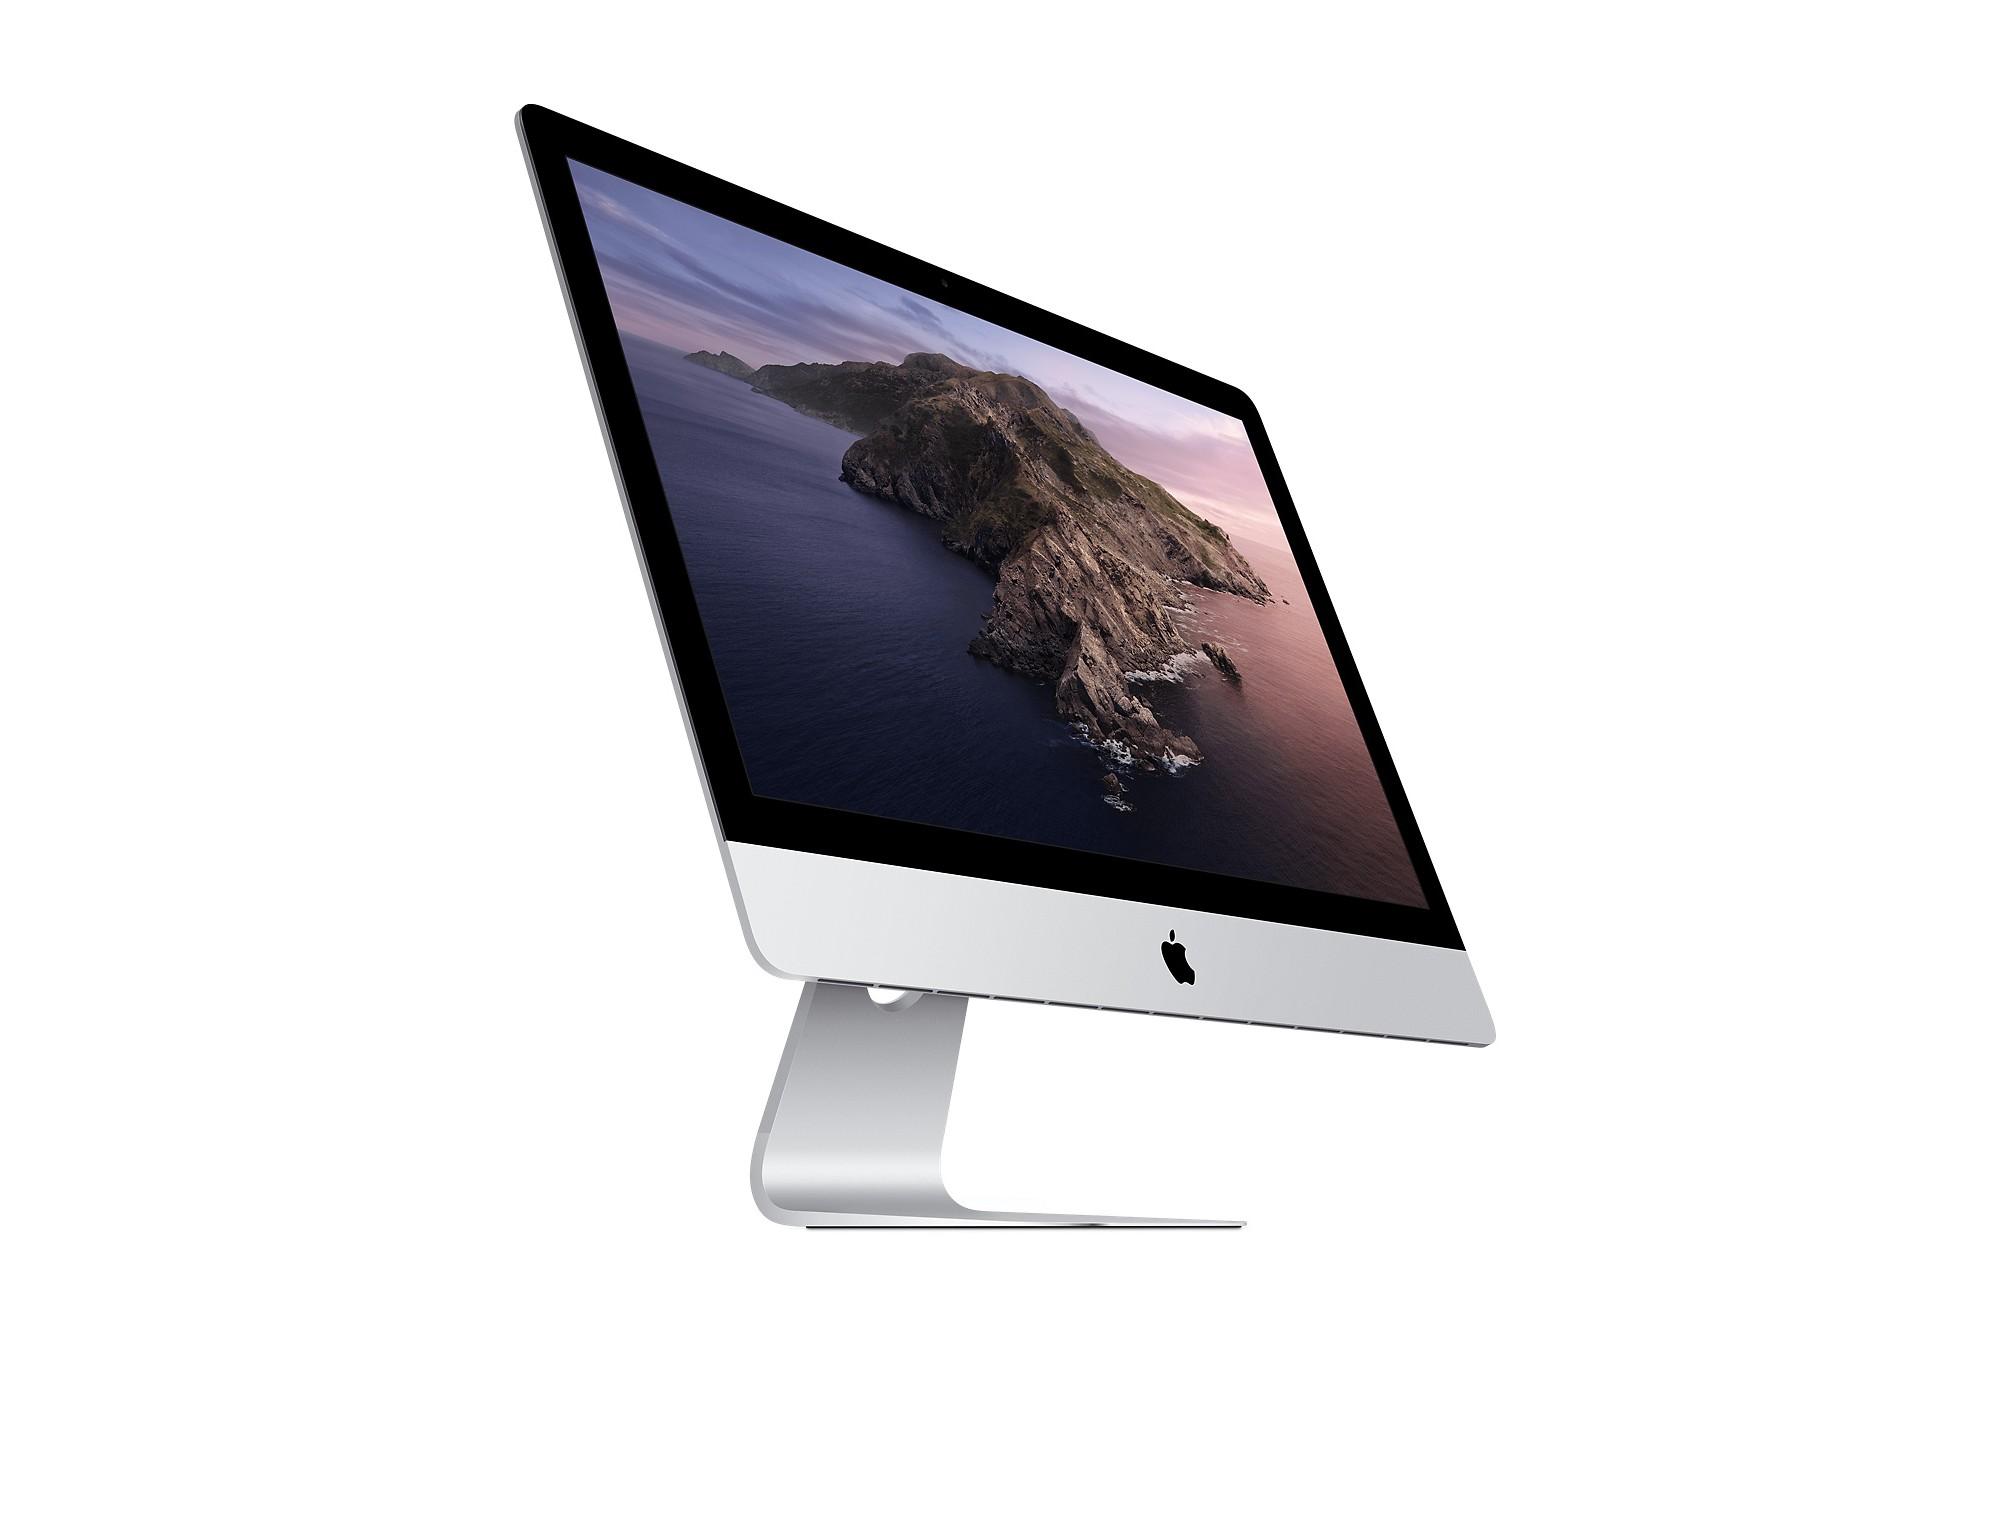 iMac 27 Inch 2020 - 3.6GHz 10-Core i9 64GB 1TB Radeon Pro 5700 XT 16GB